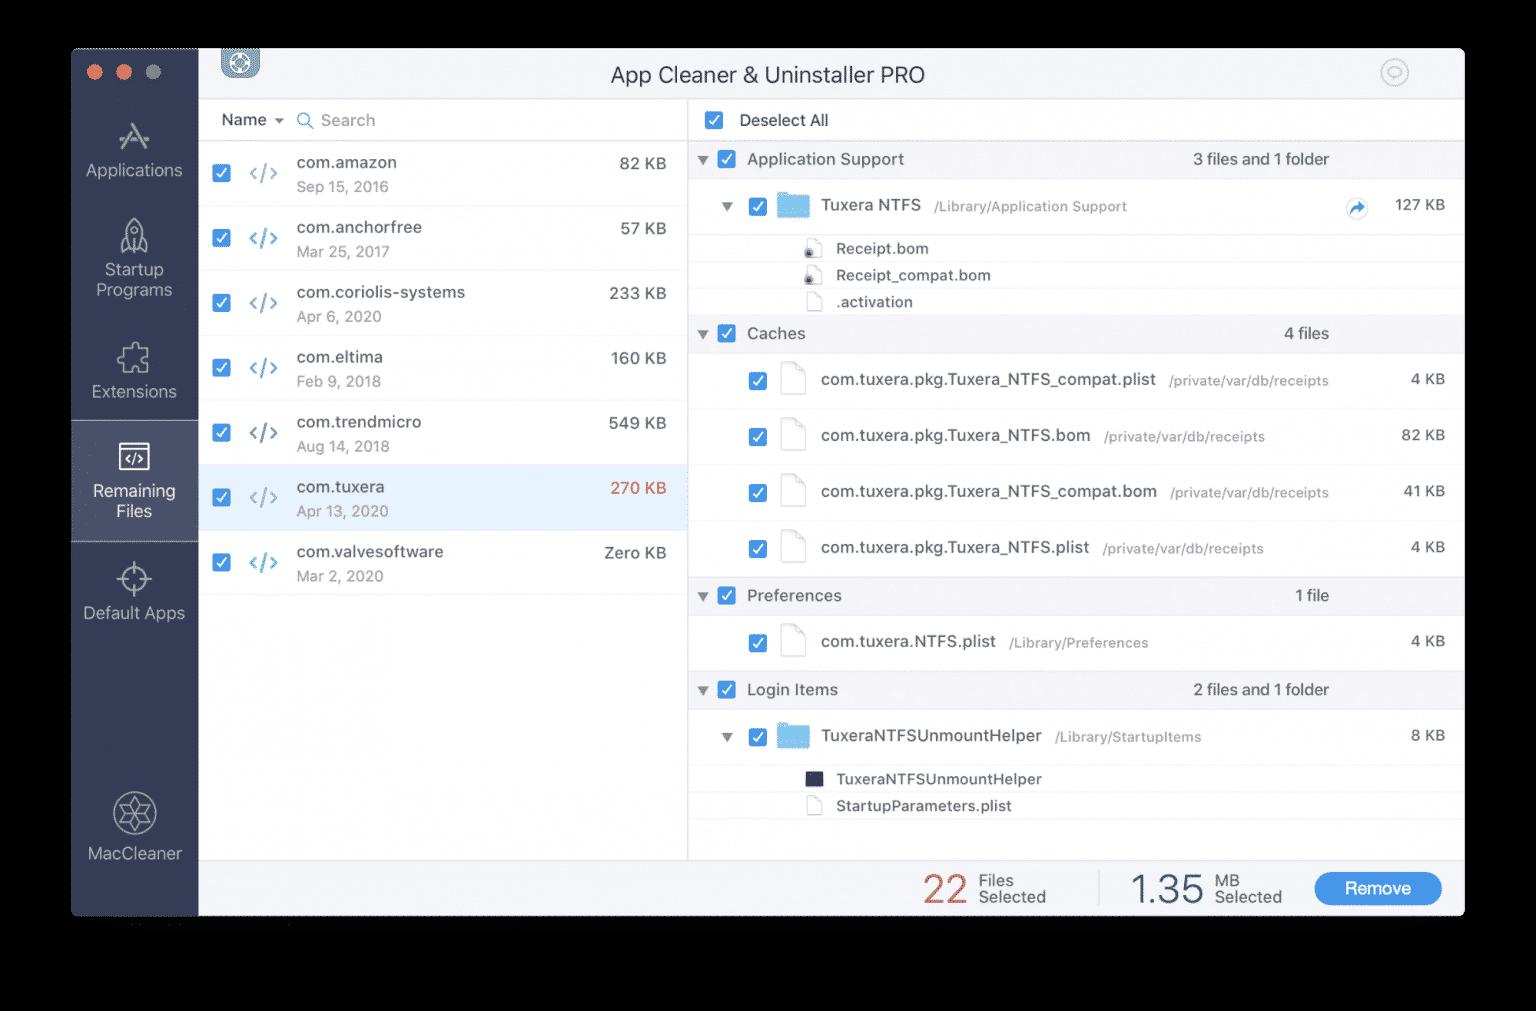 App Cleaner & Uninstaller showing remaining files